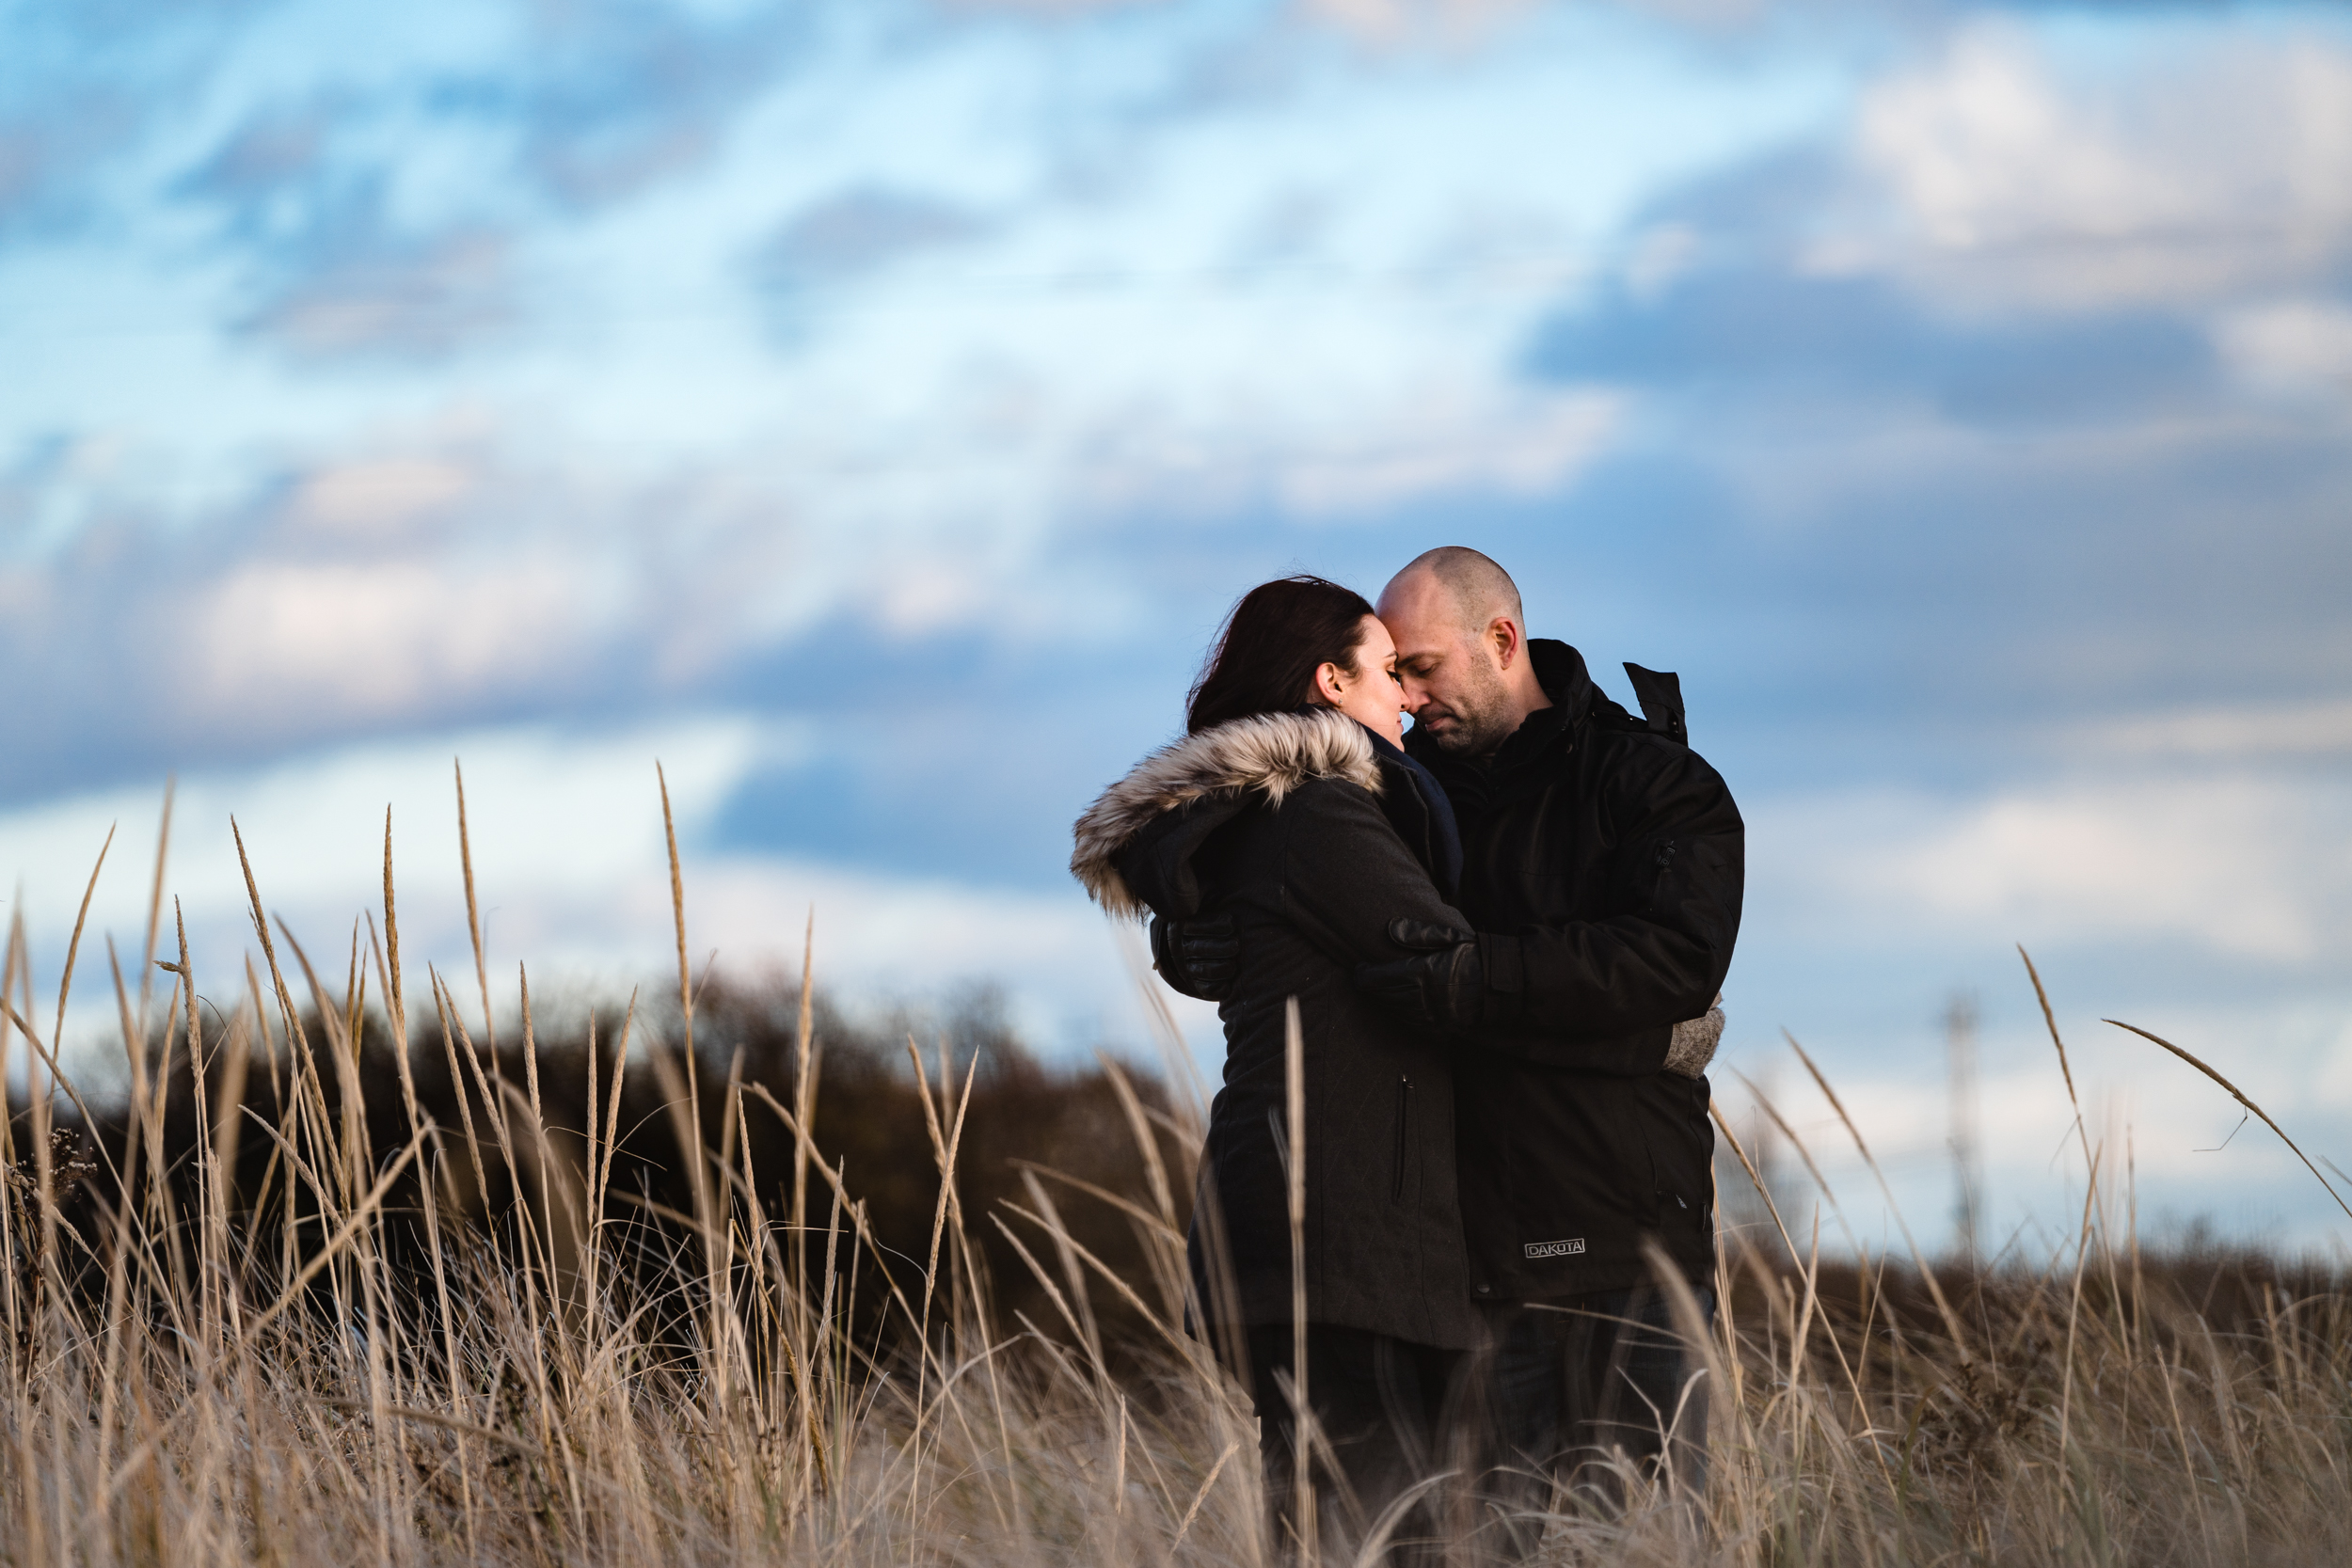 Sarah&Shayne-Halifax-engagement-weddingphotography-weddingphotographers-novascotia (17 of 41).jpg